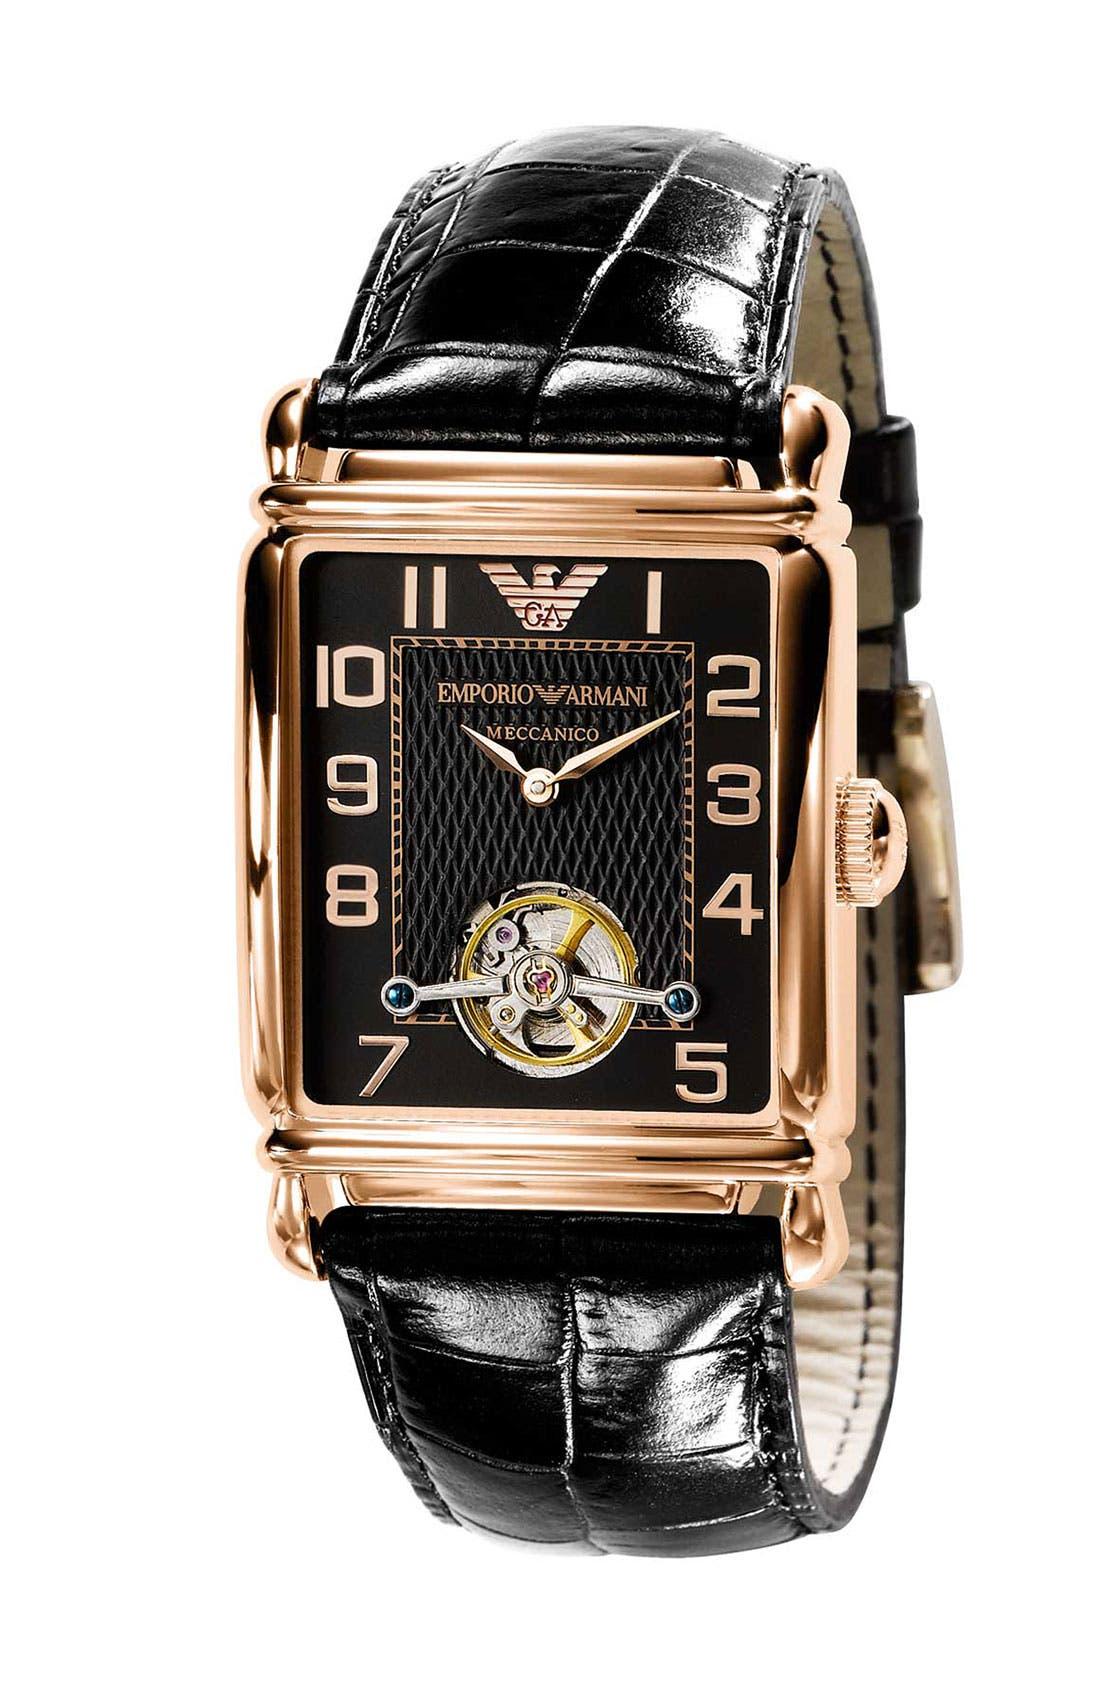 Main Image - Emporio Armani 'Meccanico' Automatic Rectangular Watch